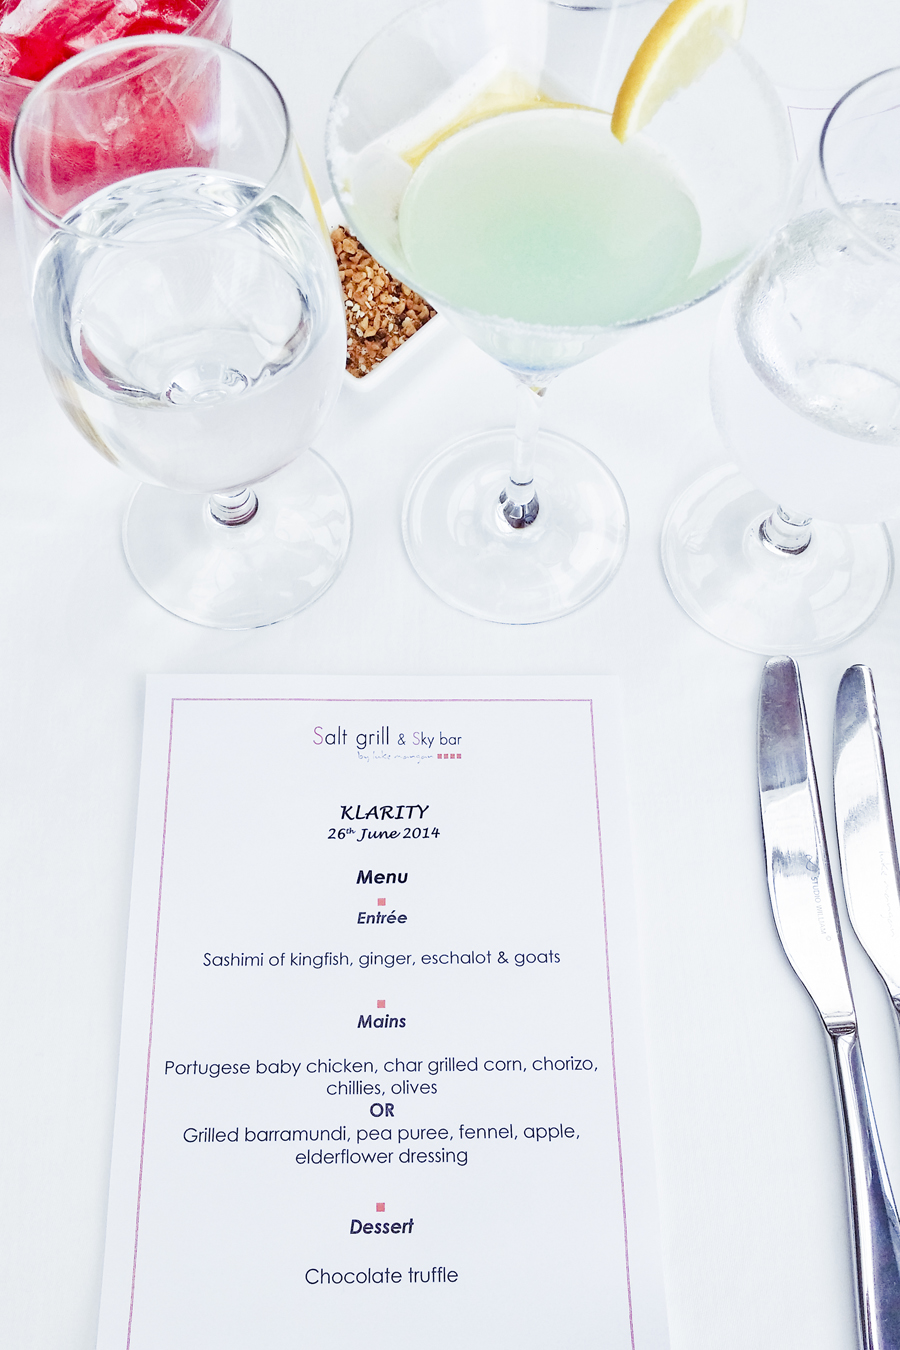 Brunch menu at the Klarity Beauty Brunch event at the Salt Grill & Sky Bar.